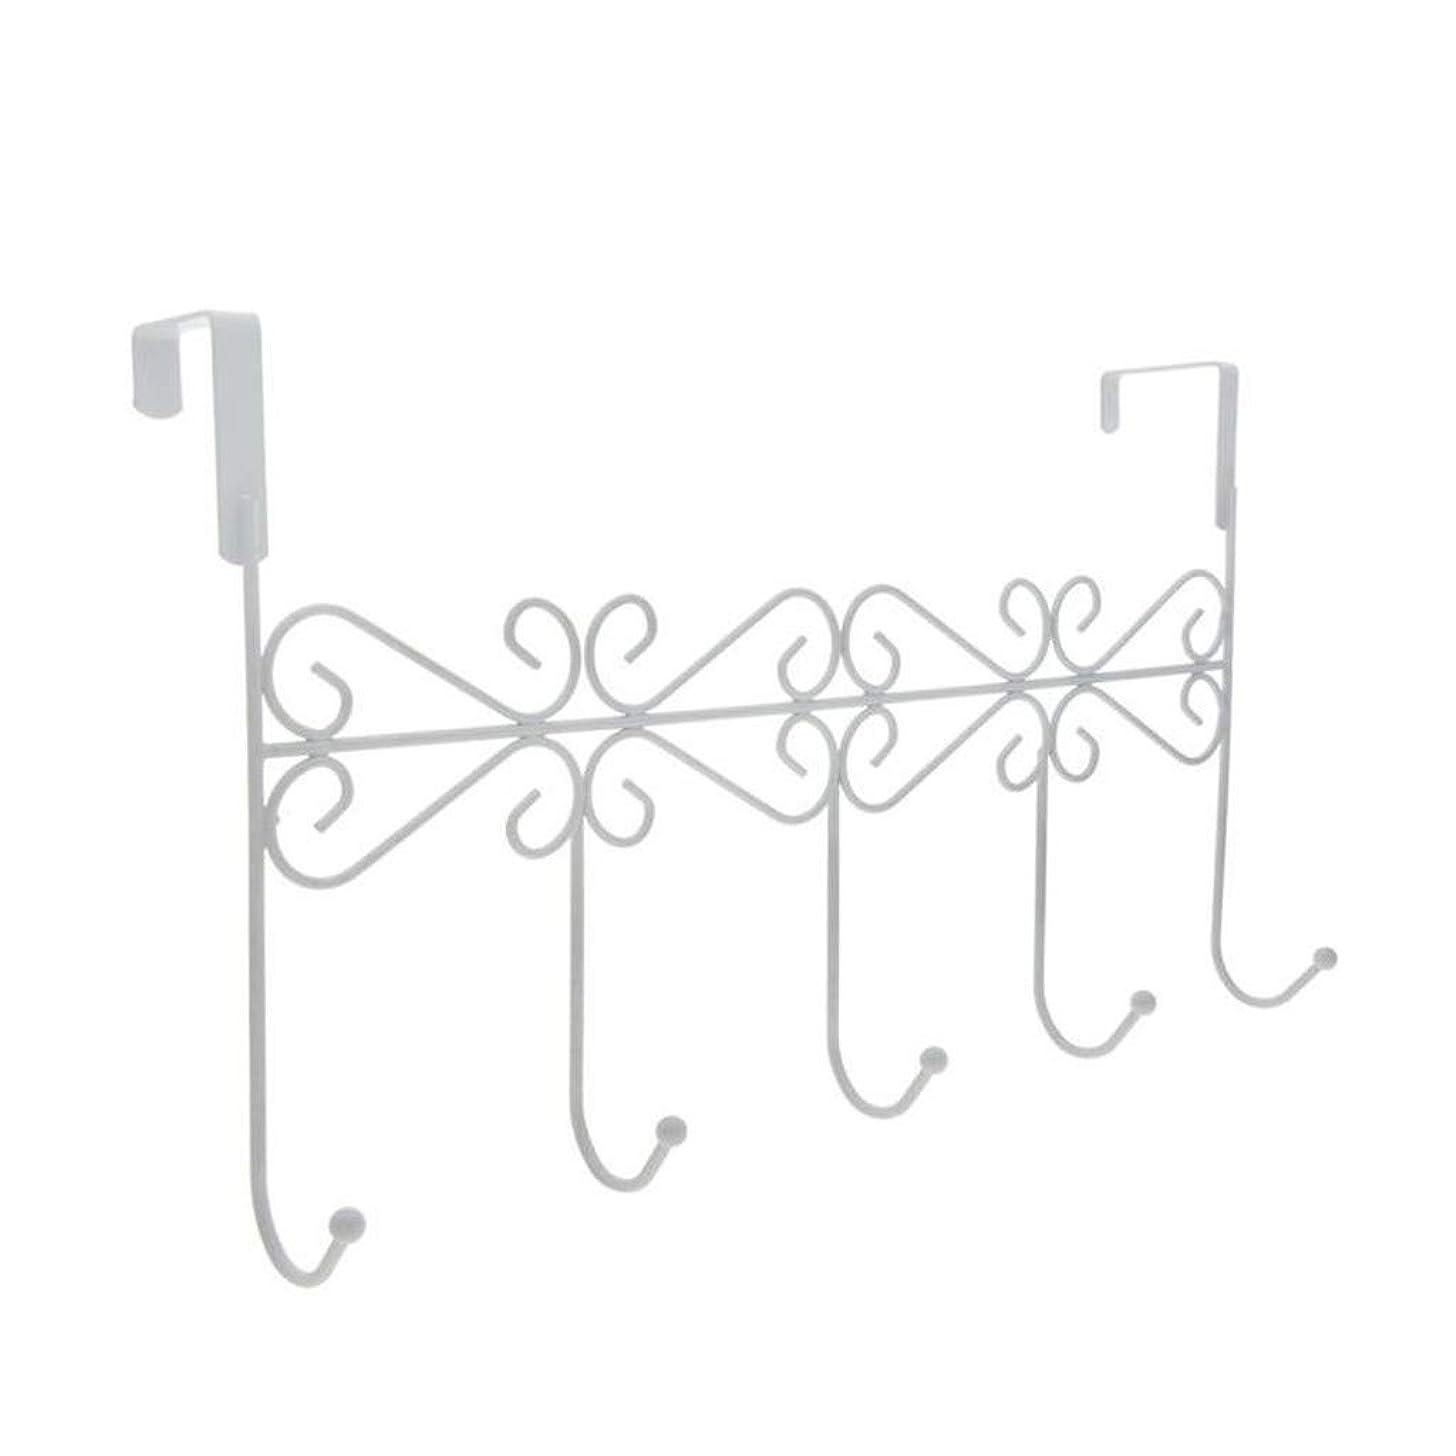 Topgee Stick Hanger Hook- Wall Mounted Watering Storage Hook Rack Punch-Free Creative Hook Decorative Frame Storage Finishing Rack Multiple Patterns